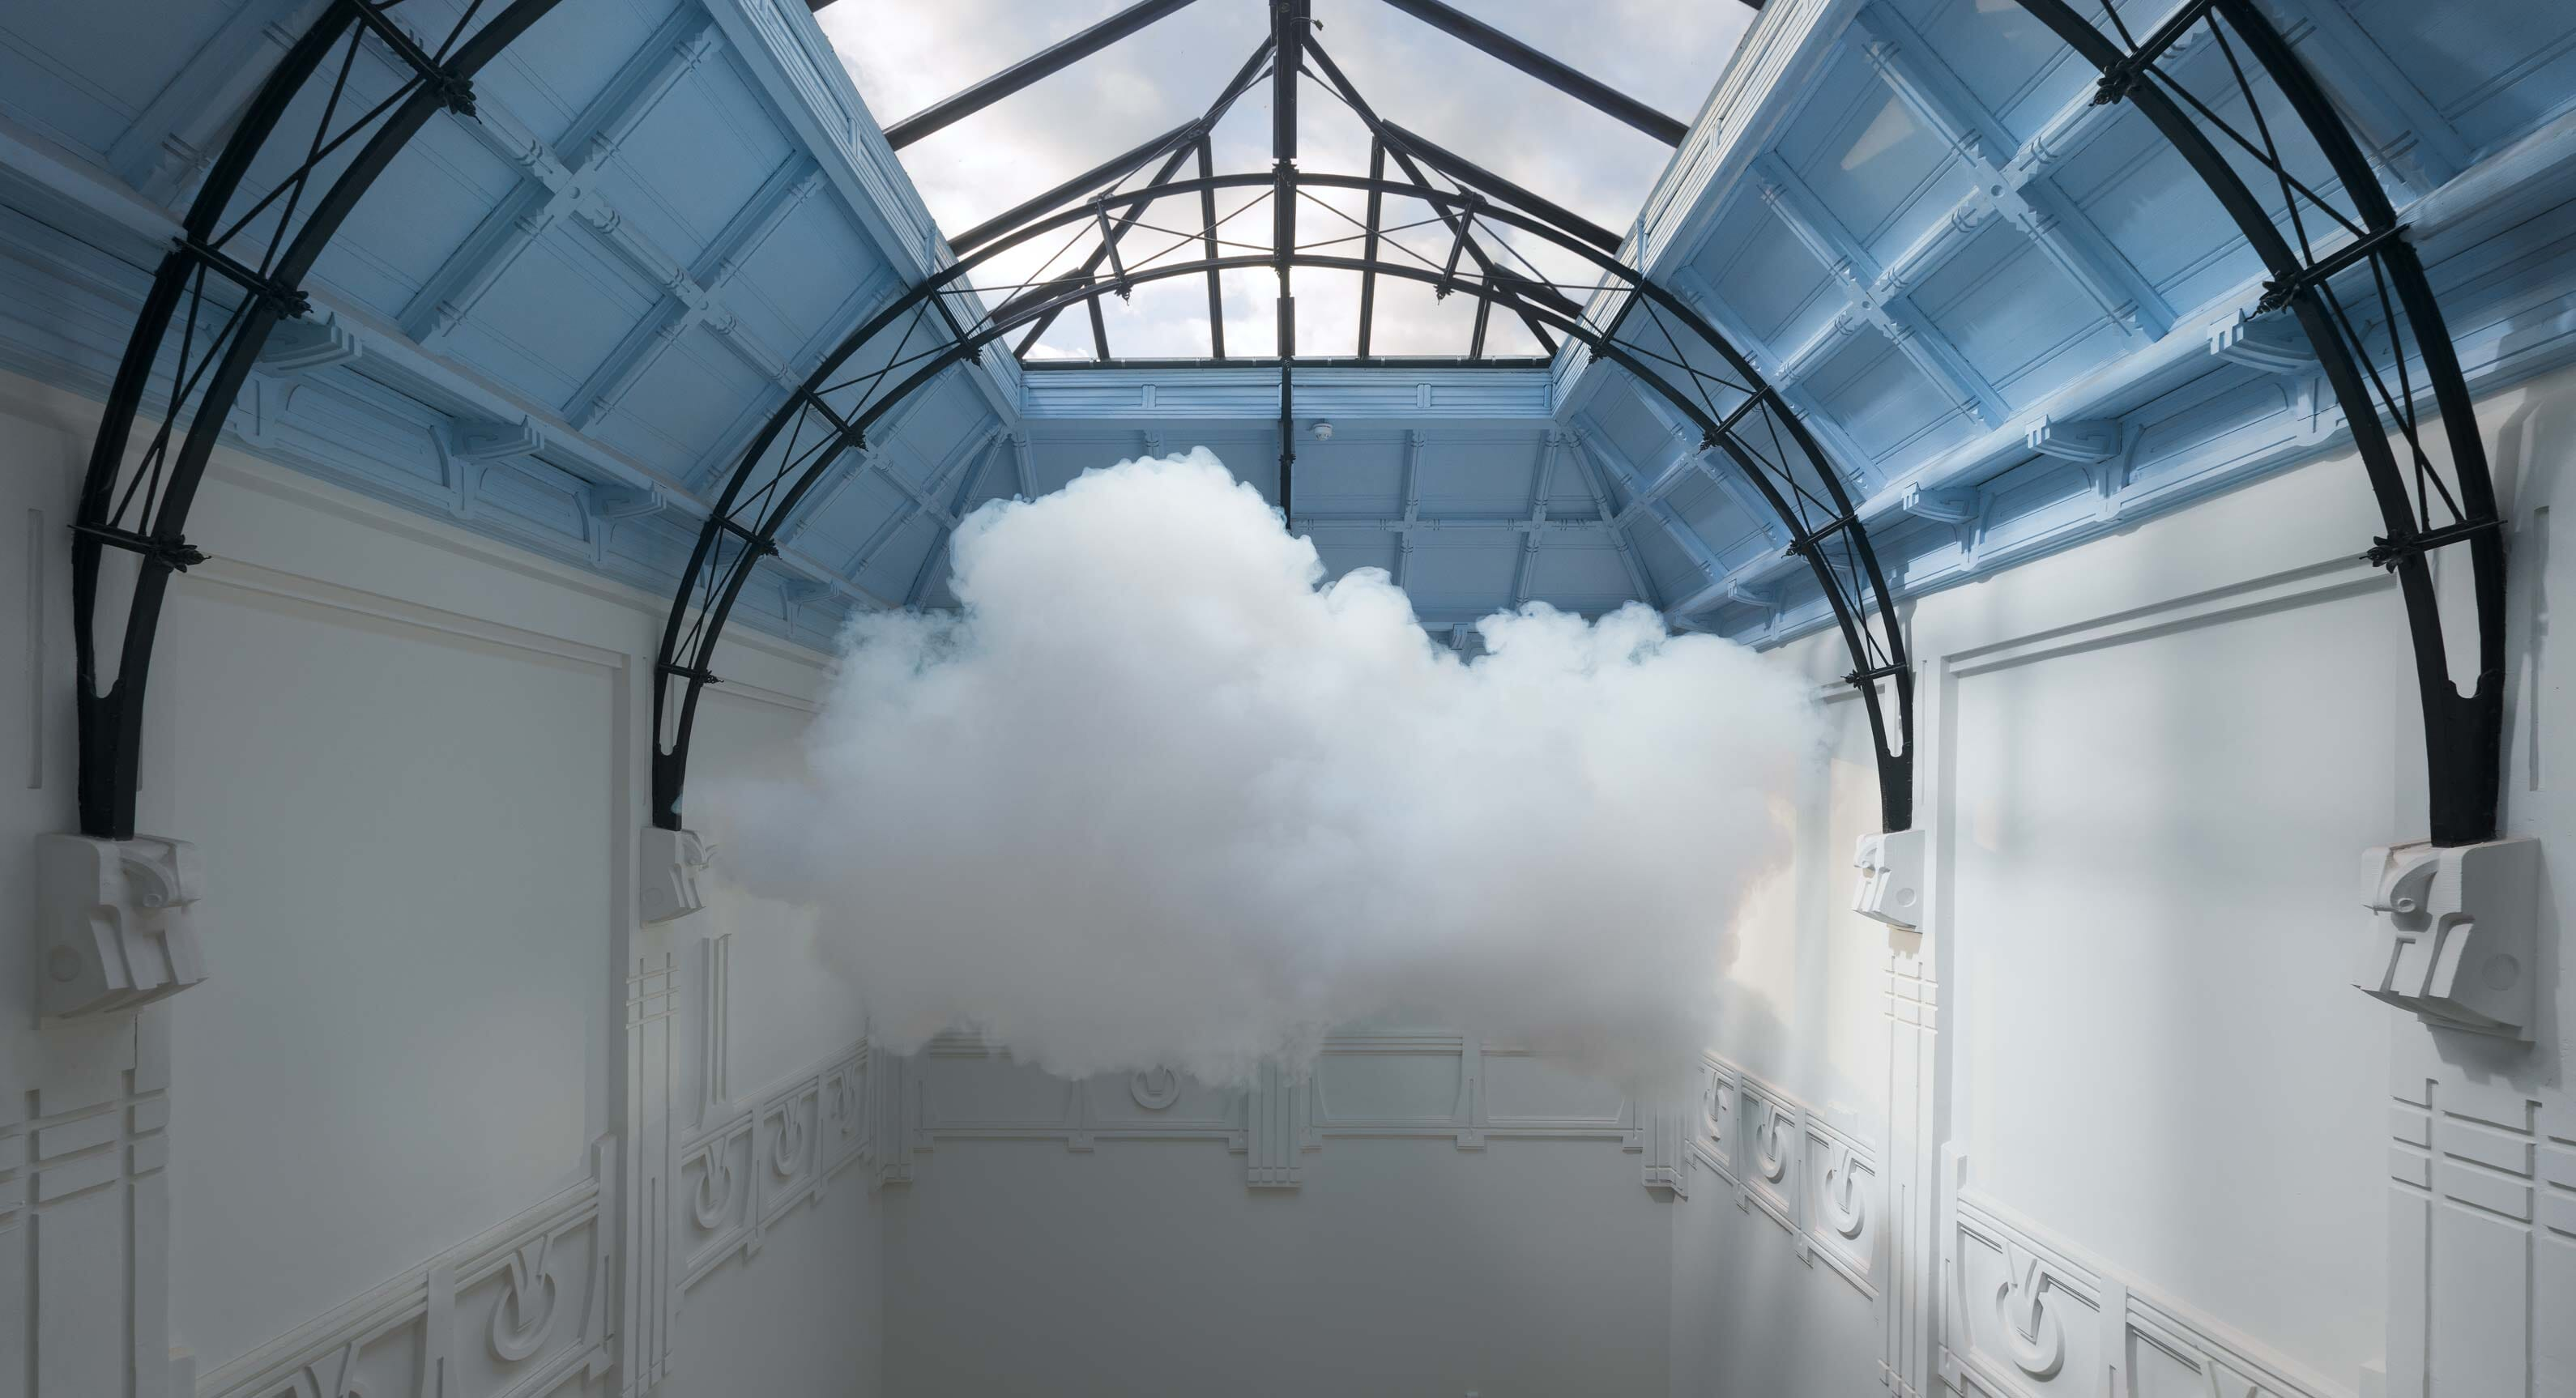 Artist Berndnaut Smilde Makes Indoor Sculptures Out Of Clouds